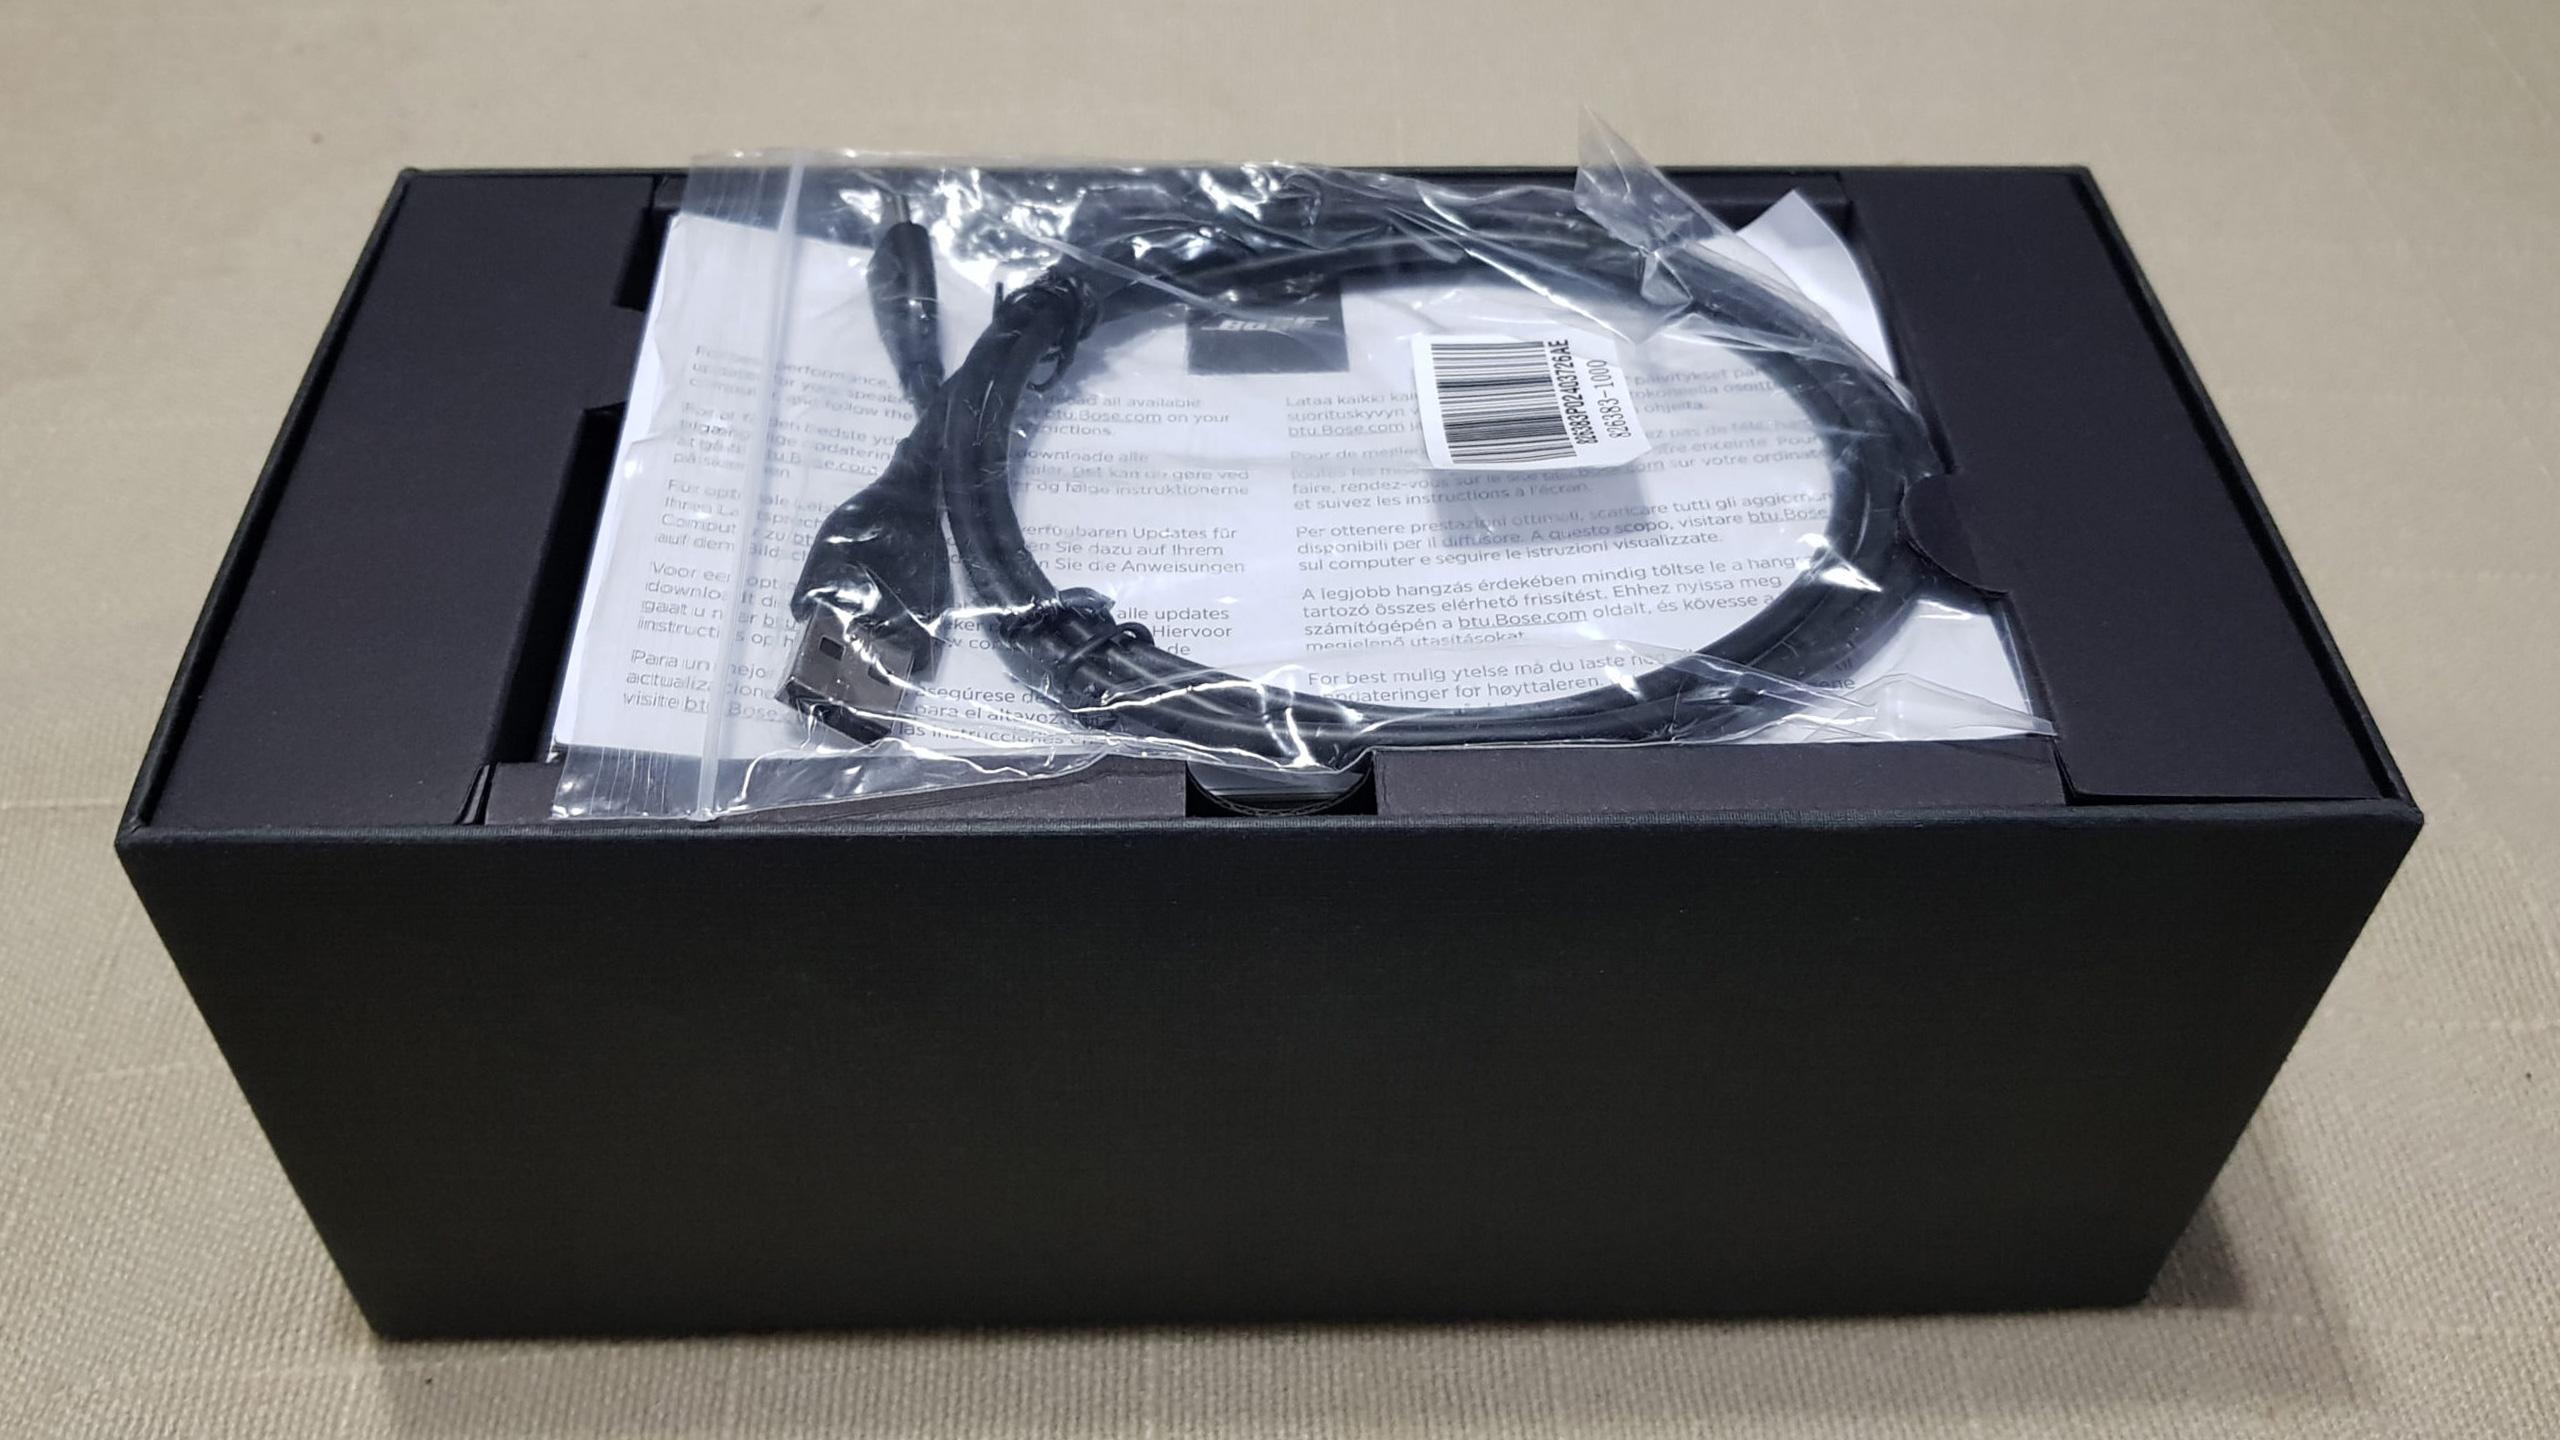 Bose SoundLink Mini II: Caja